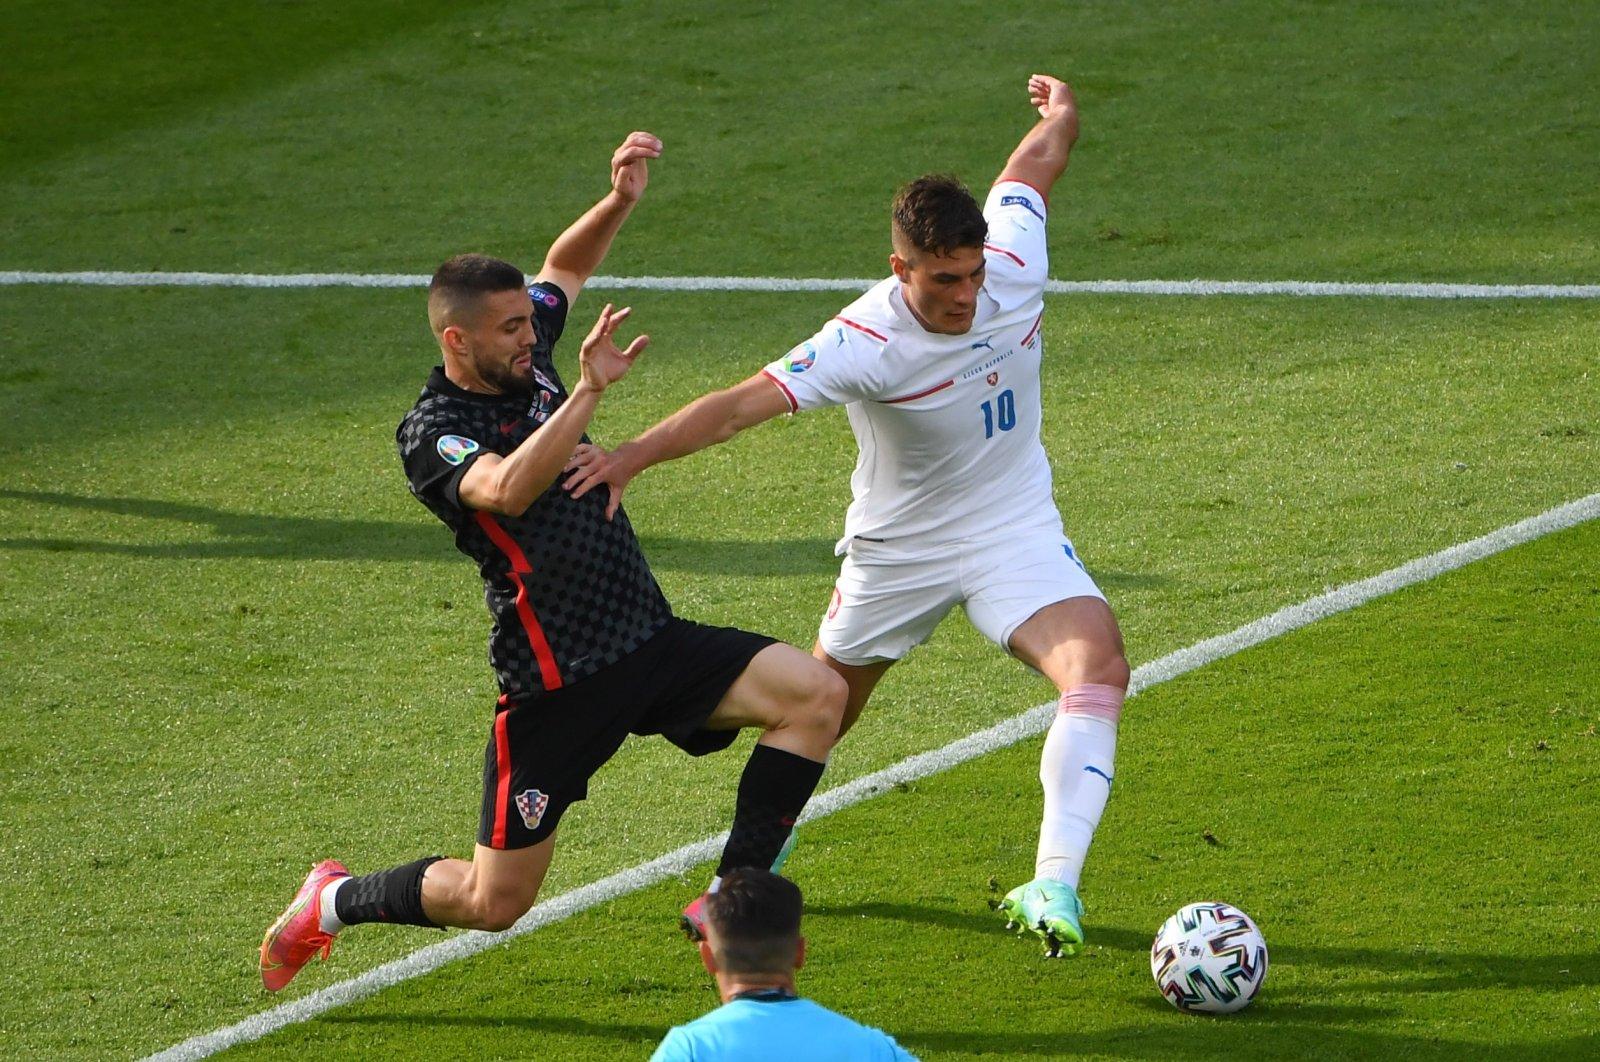 Croatia's Mateo Kovacic (L) in action with Czech Republic's Patrik Schick in a Euro 2020 Group D football match between Croatia and the Czech Republic in Hampden Park, Glasgow, Scotland, U.K., June 18, 2021. (Reuters Photo)